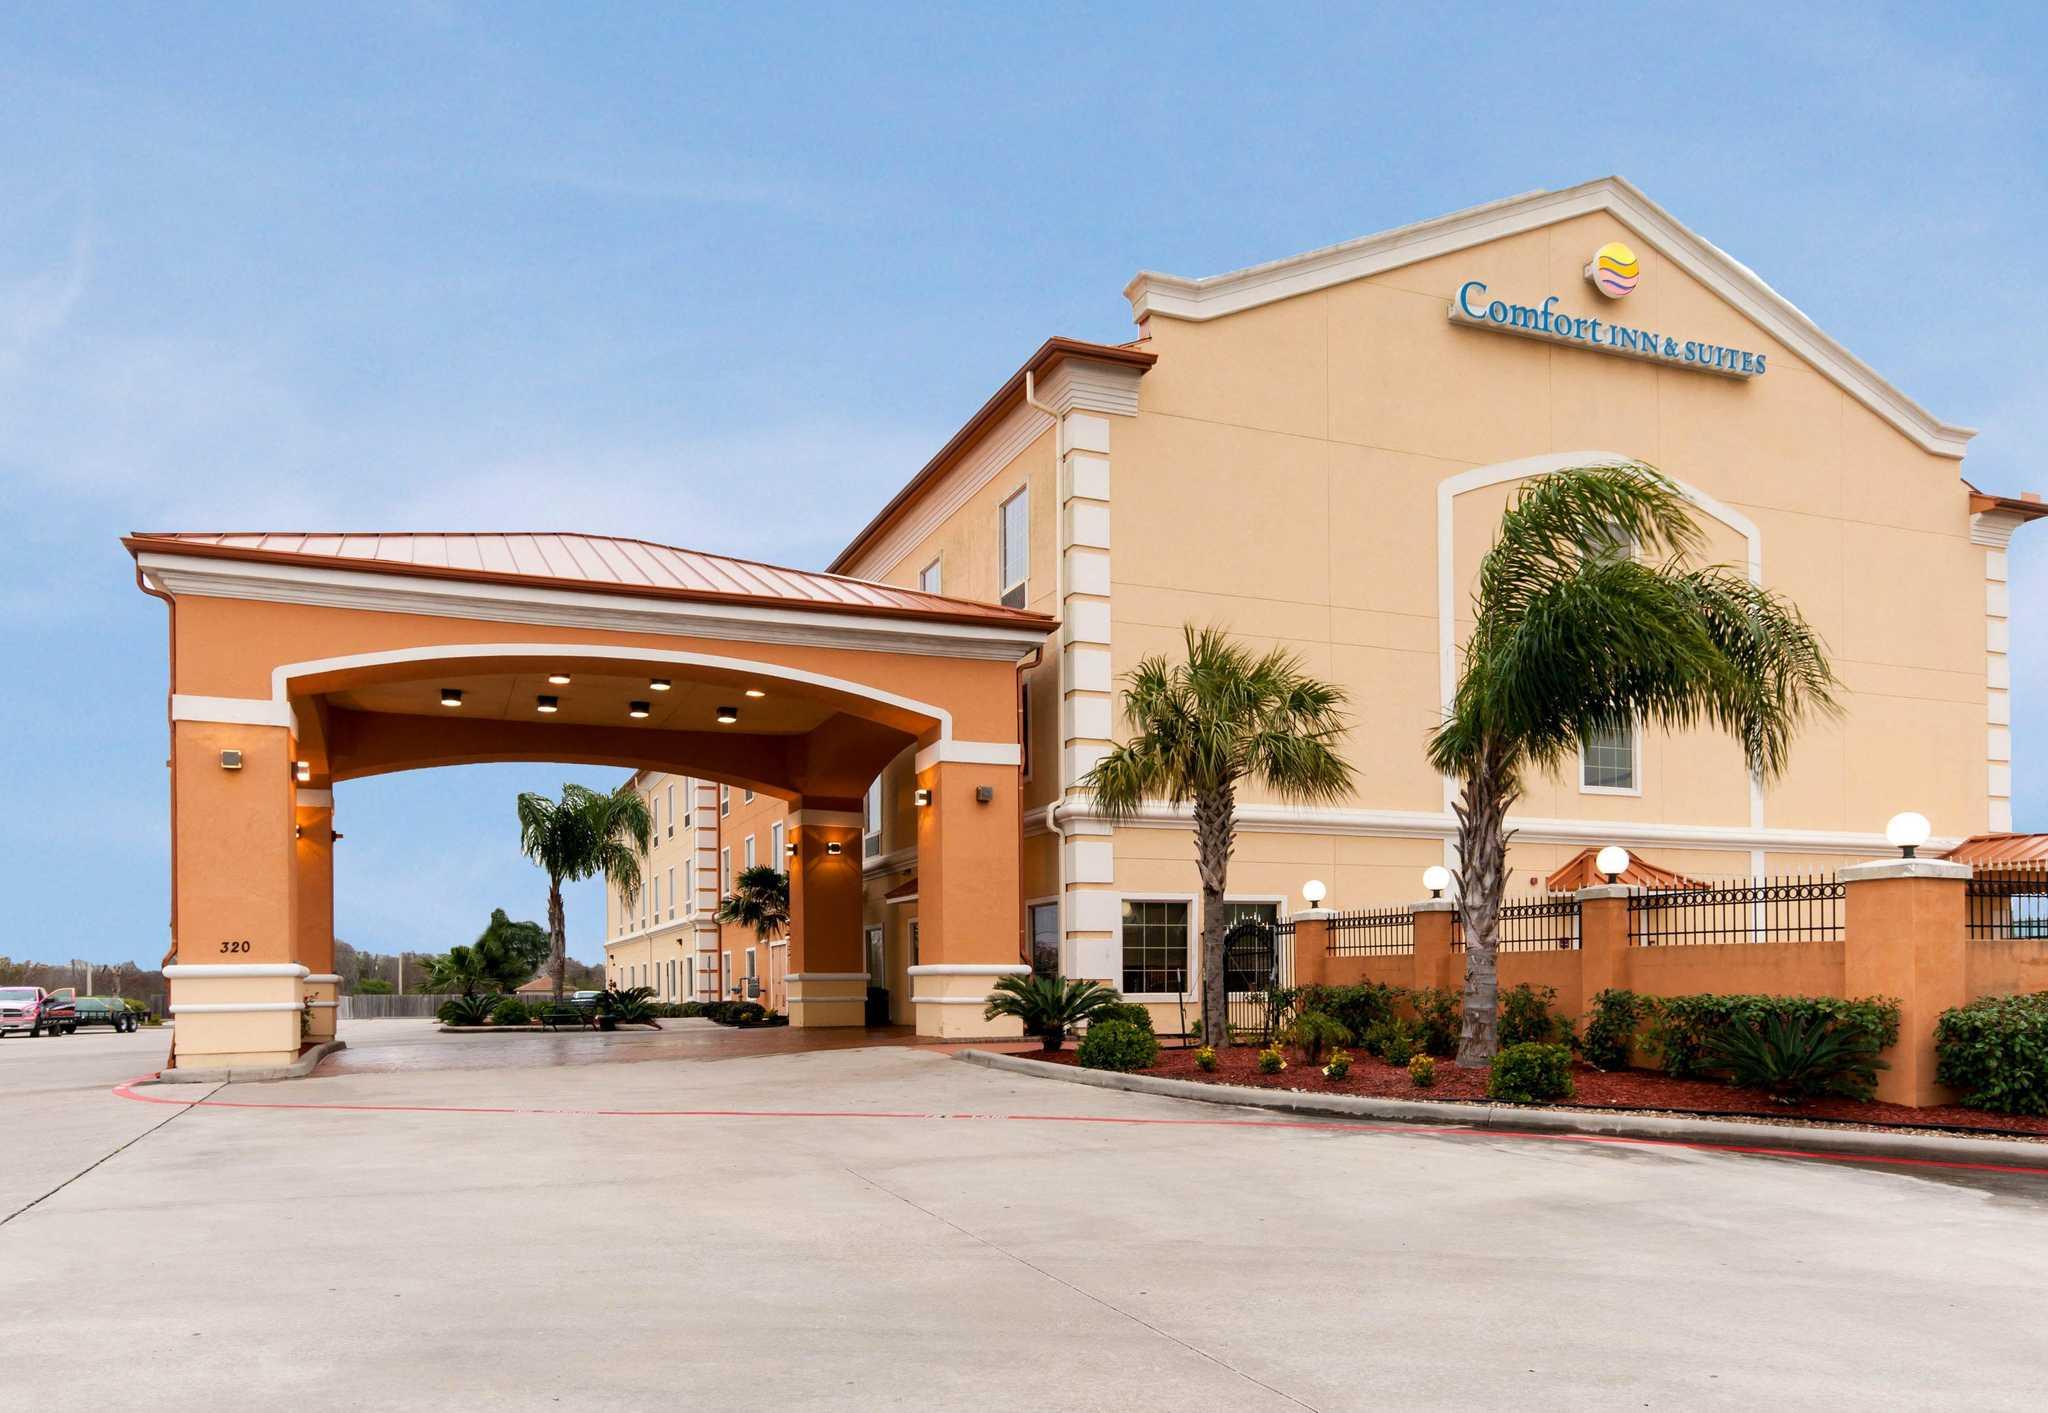 Comfort Inn Amp Suites Texas City 320 Highway 146 North